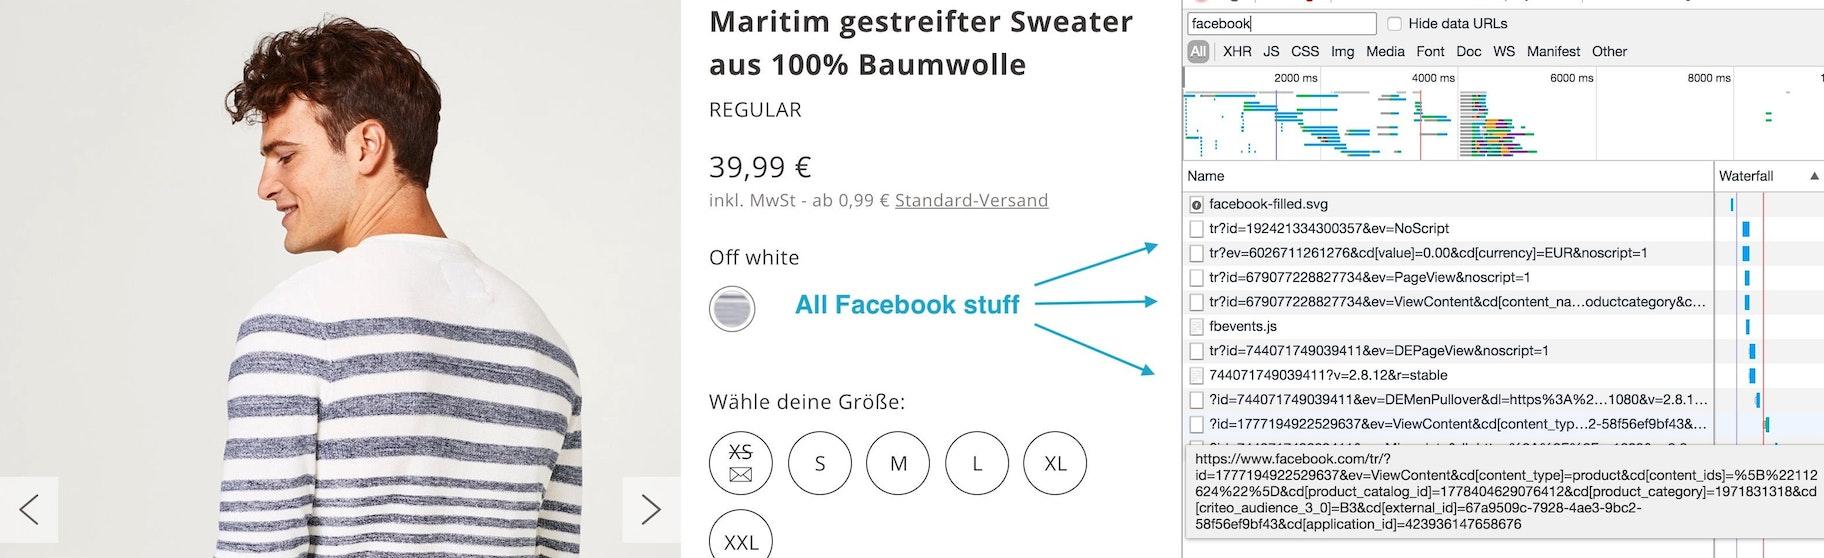 1603967900 esprit shopping code